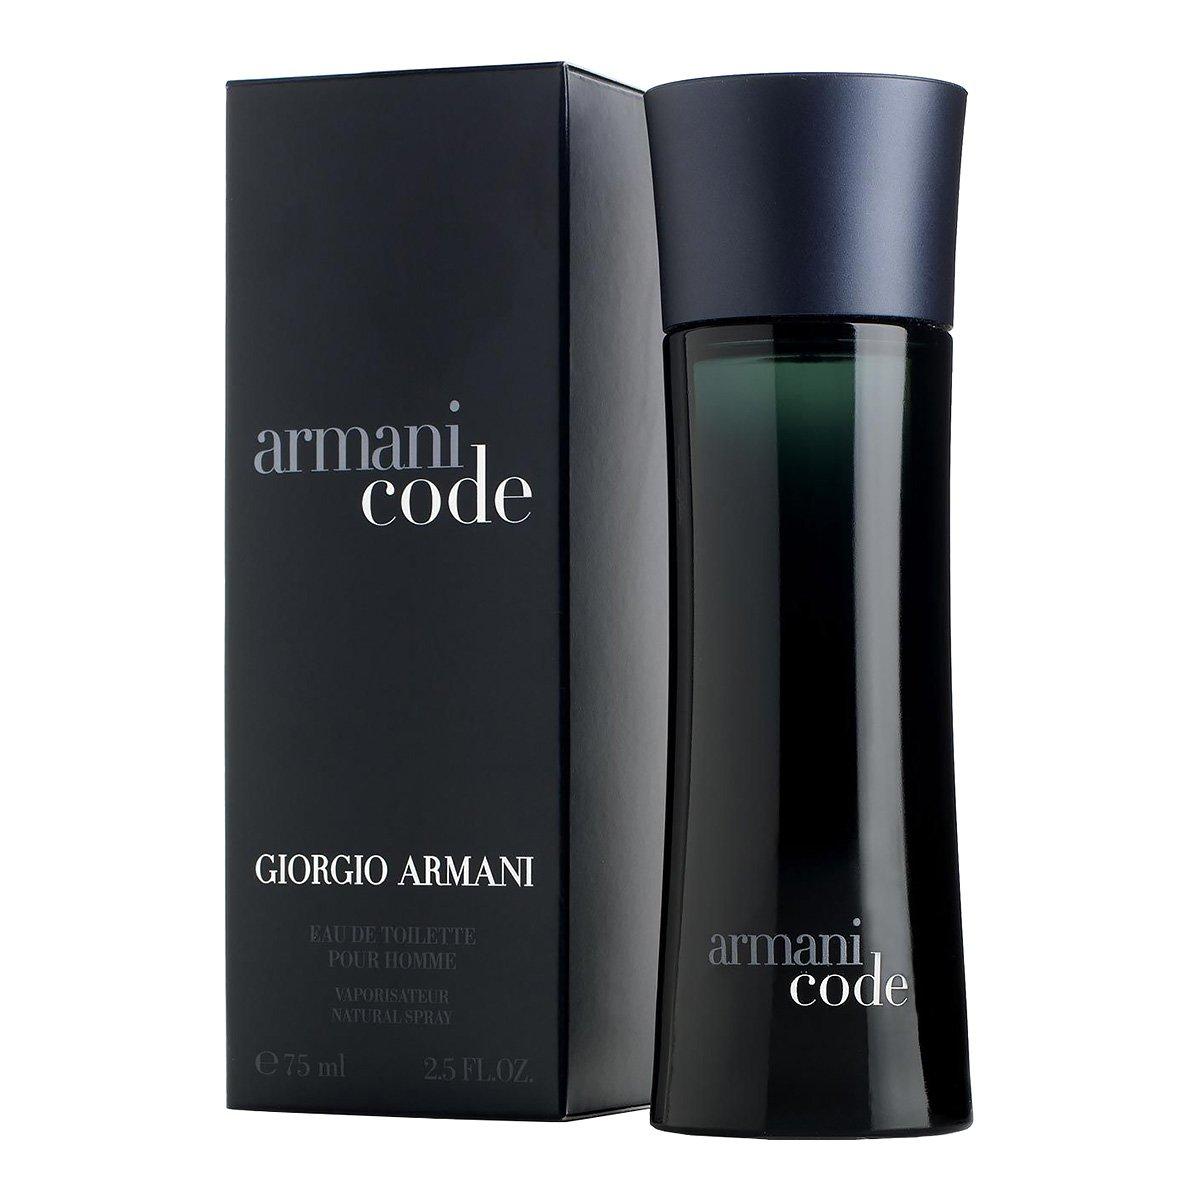 Giorgio Armani Armani Code Pour Homme купить в минске и рб